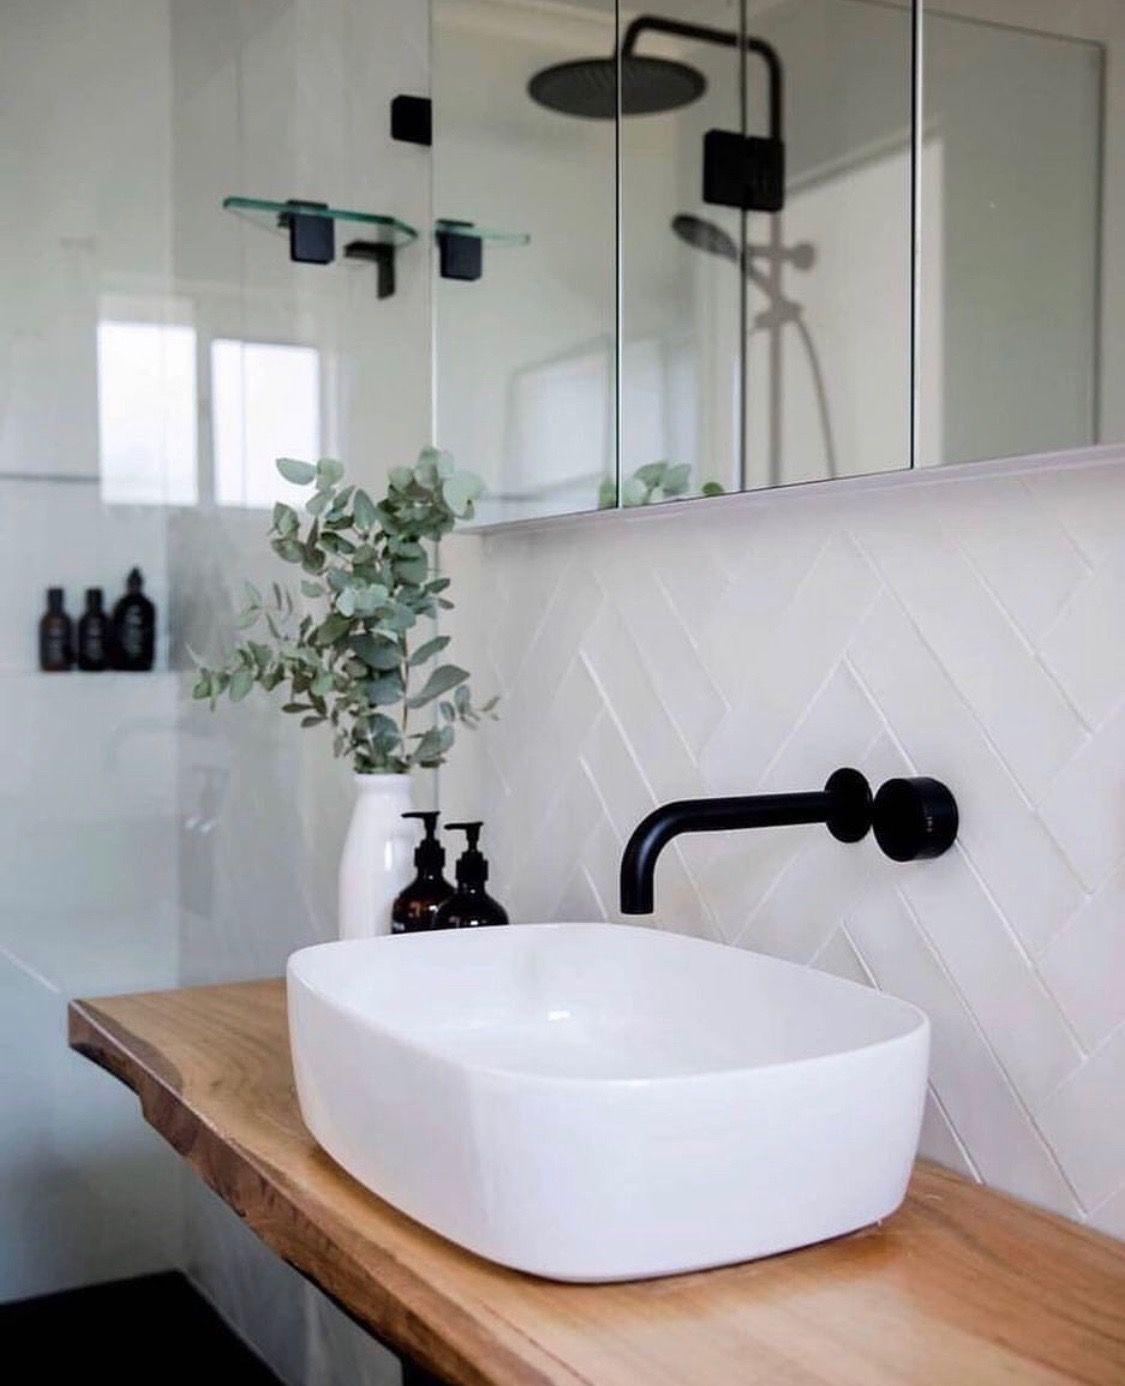 Pin By Rachelktate On Bathrooms In 2019 Pinterest Badezimmer